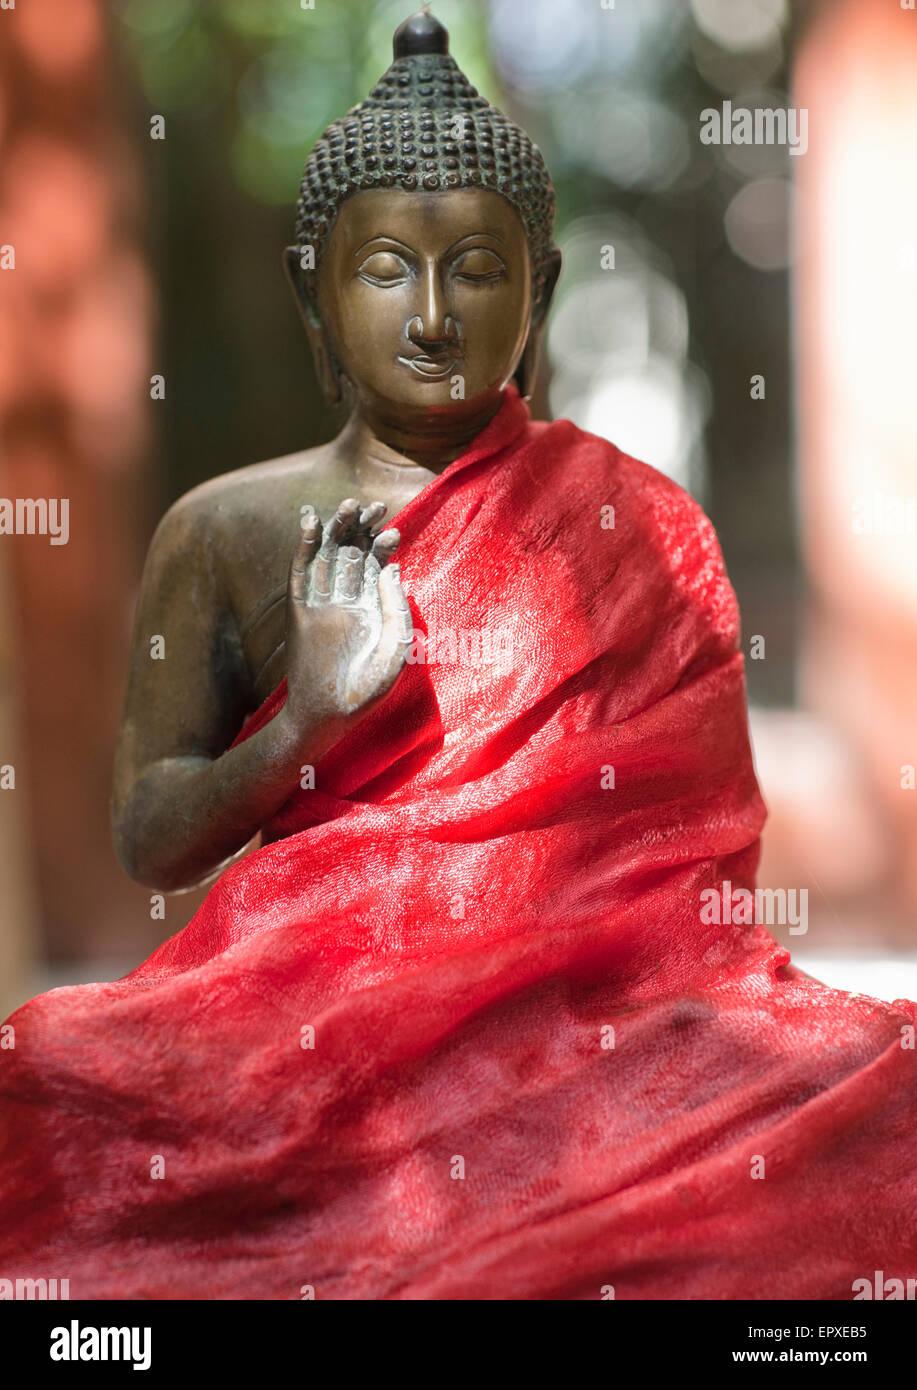 Statua del Buddha ad Ananda Spa, Ananda in Himalaya, Il Palace Station Wagon, Narendra Nagar, Tehri Garhwal, Uttarakhand, Immagini Stock